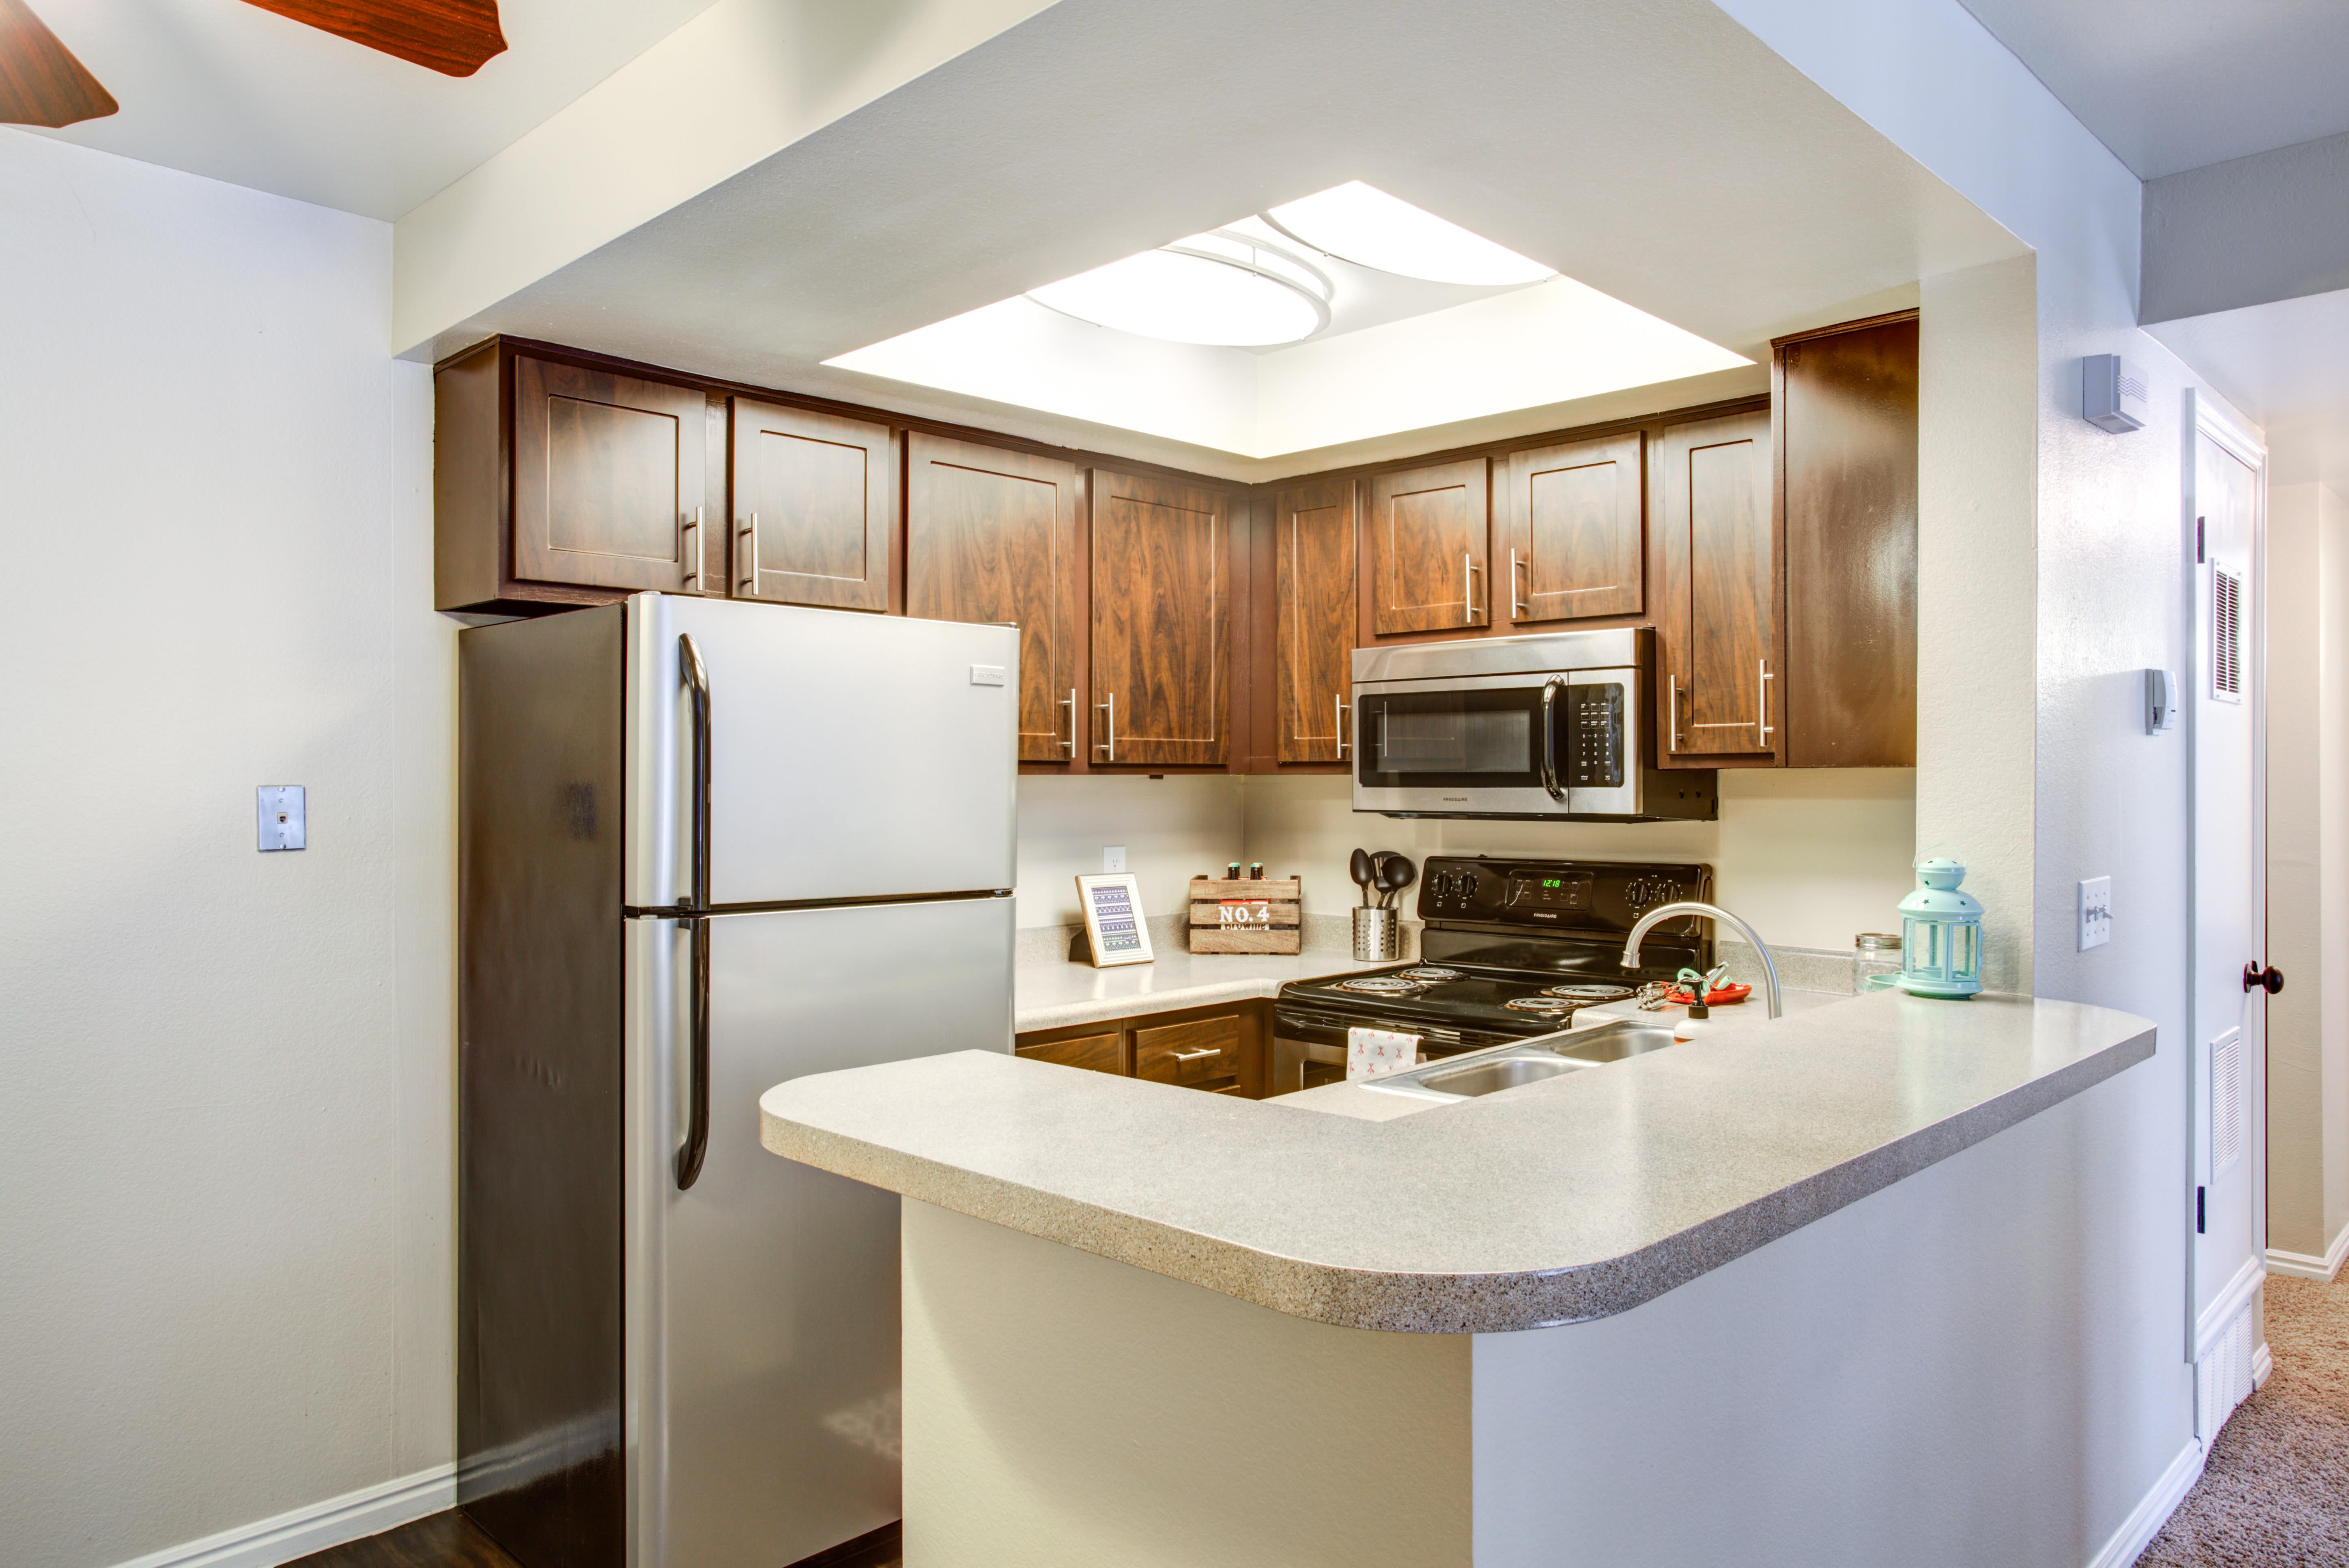 Updated kitchen at Royal Farms Apartments